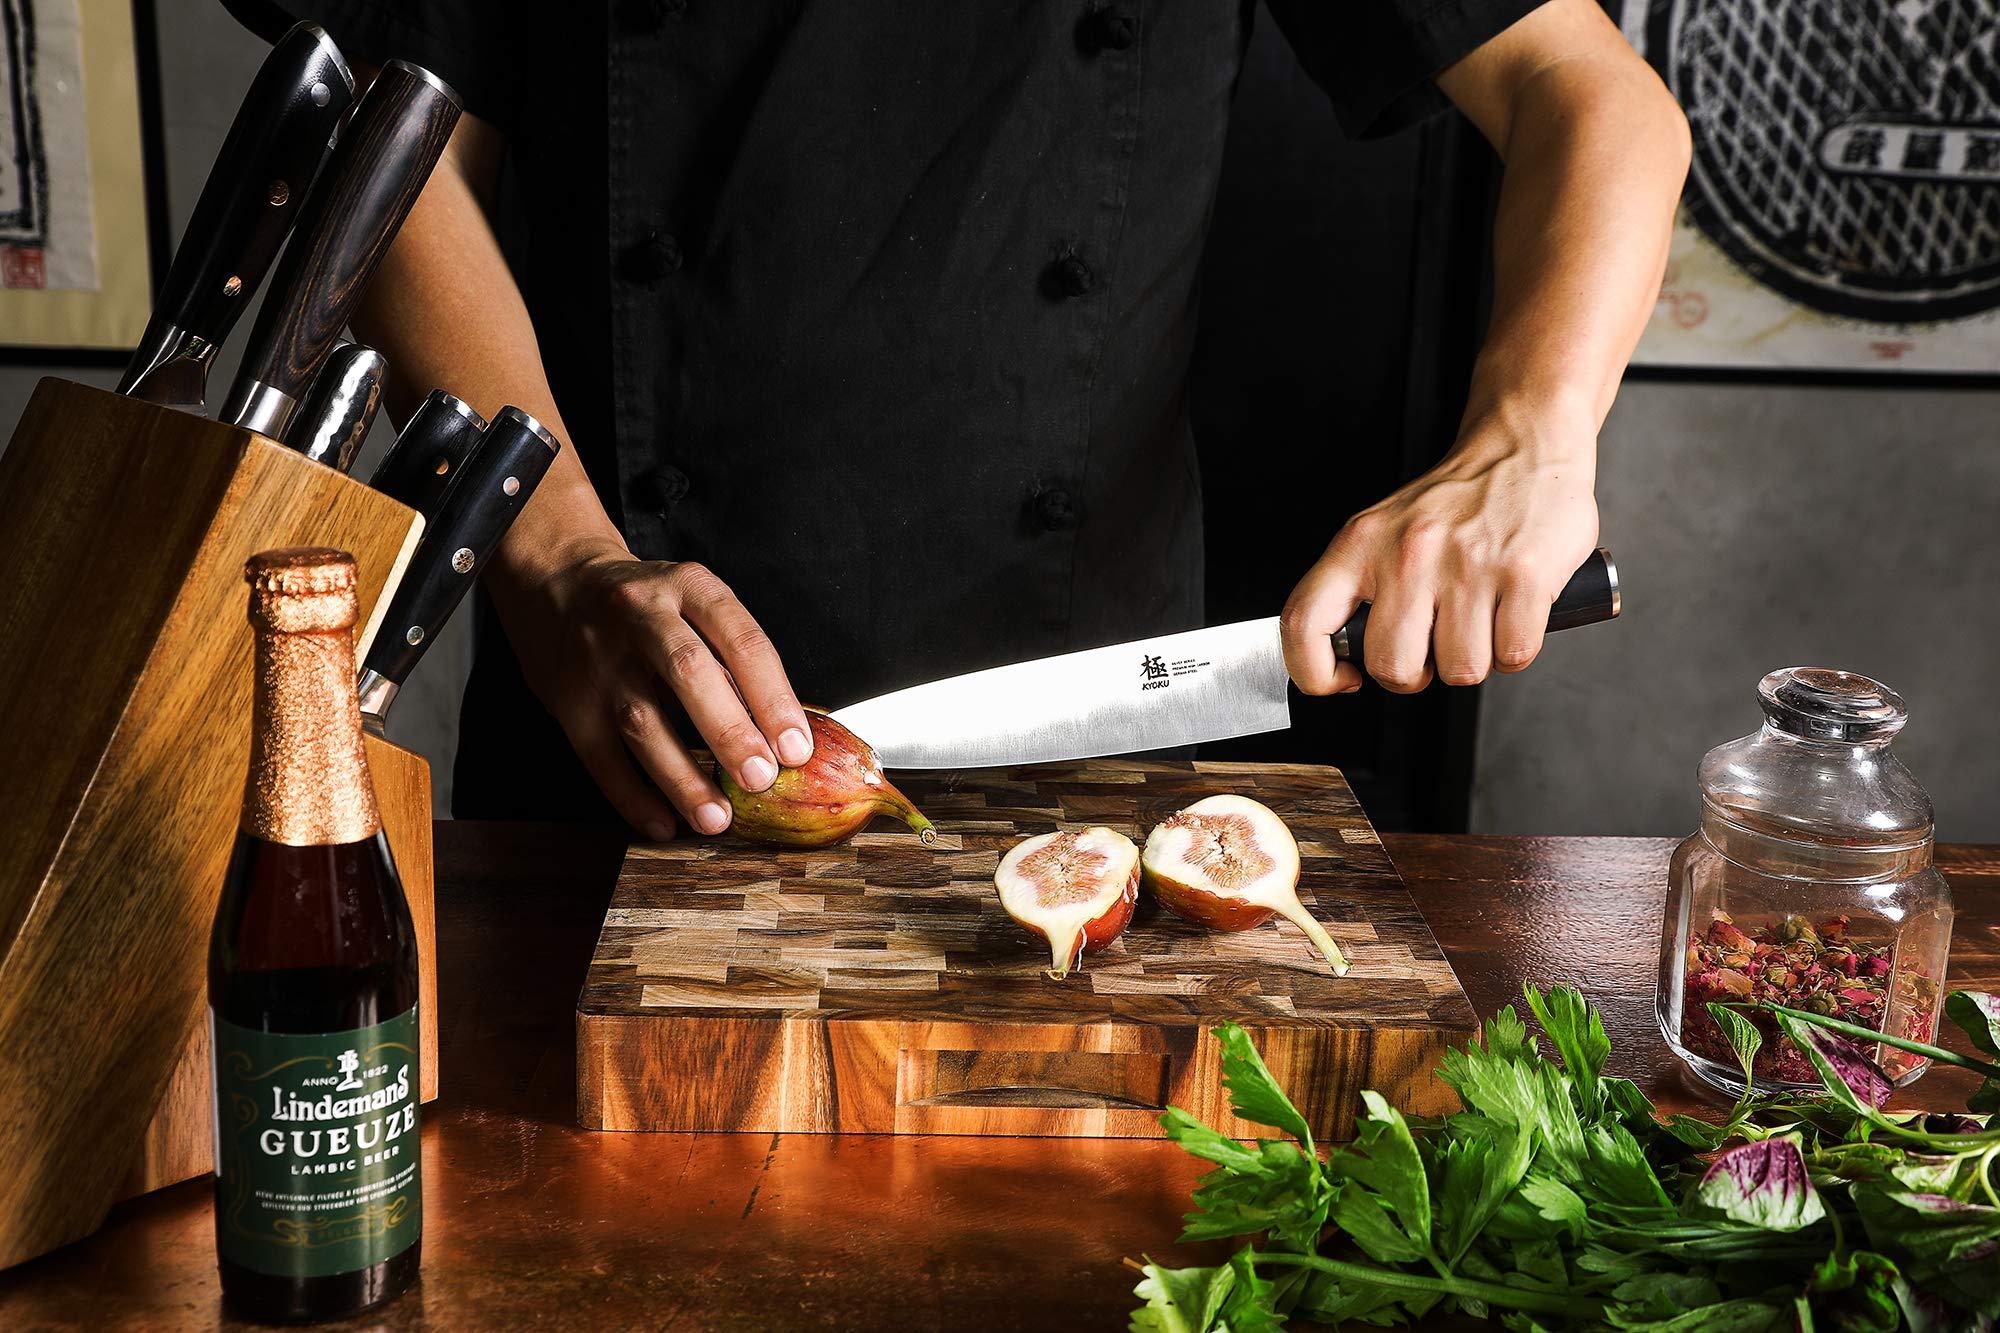 KYOKU Samurai Series - Chef Knife 8'' with Sheath Case - Japanese Steel - Ultra Sharp Blade Ergonomic Pakkawood Handle by KYOKU (Image #2)